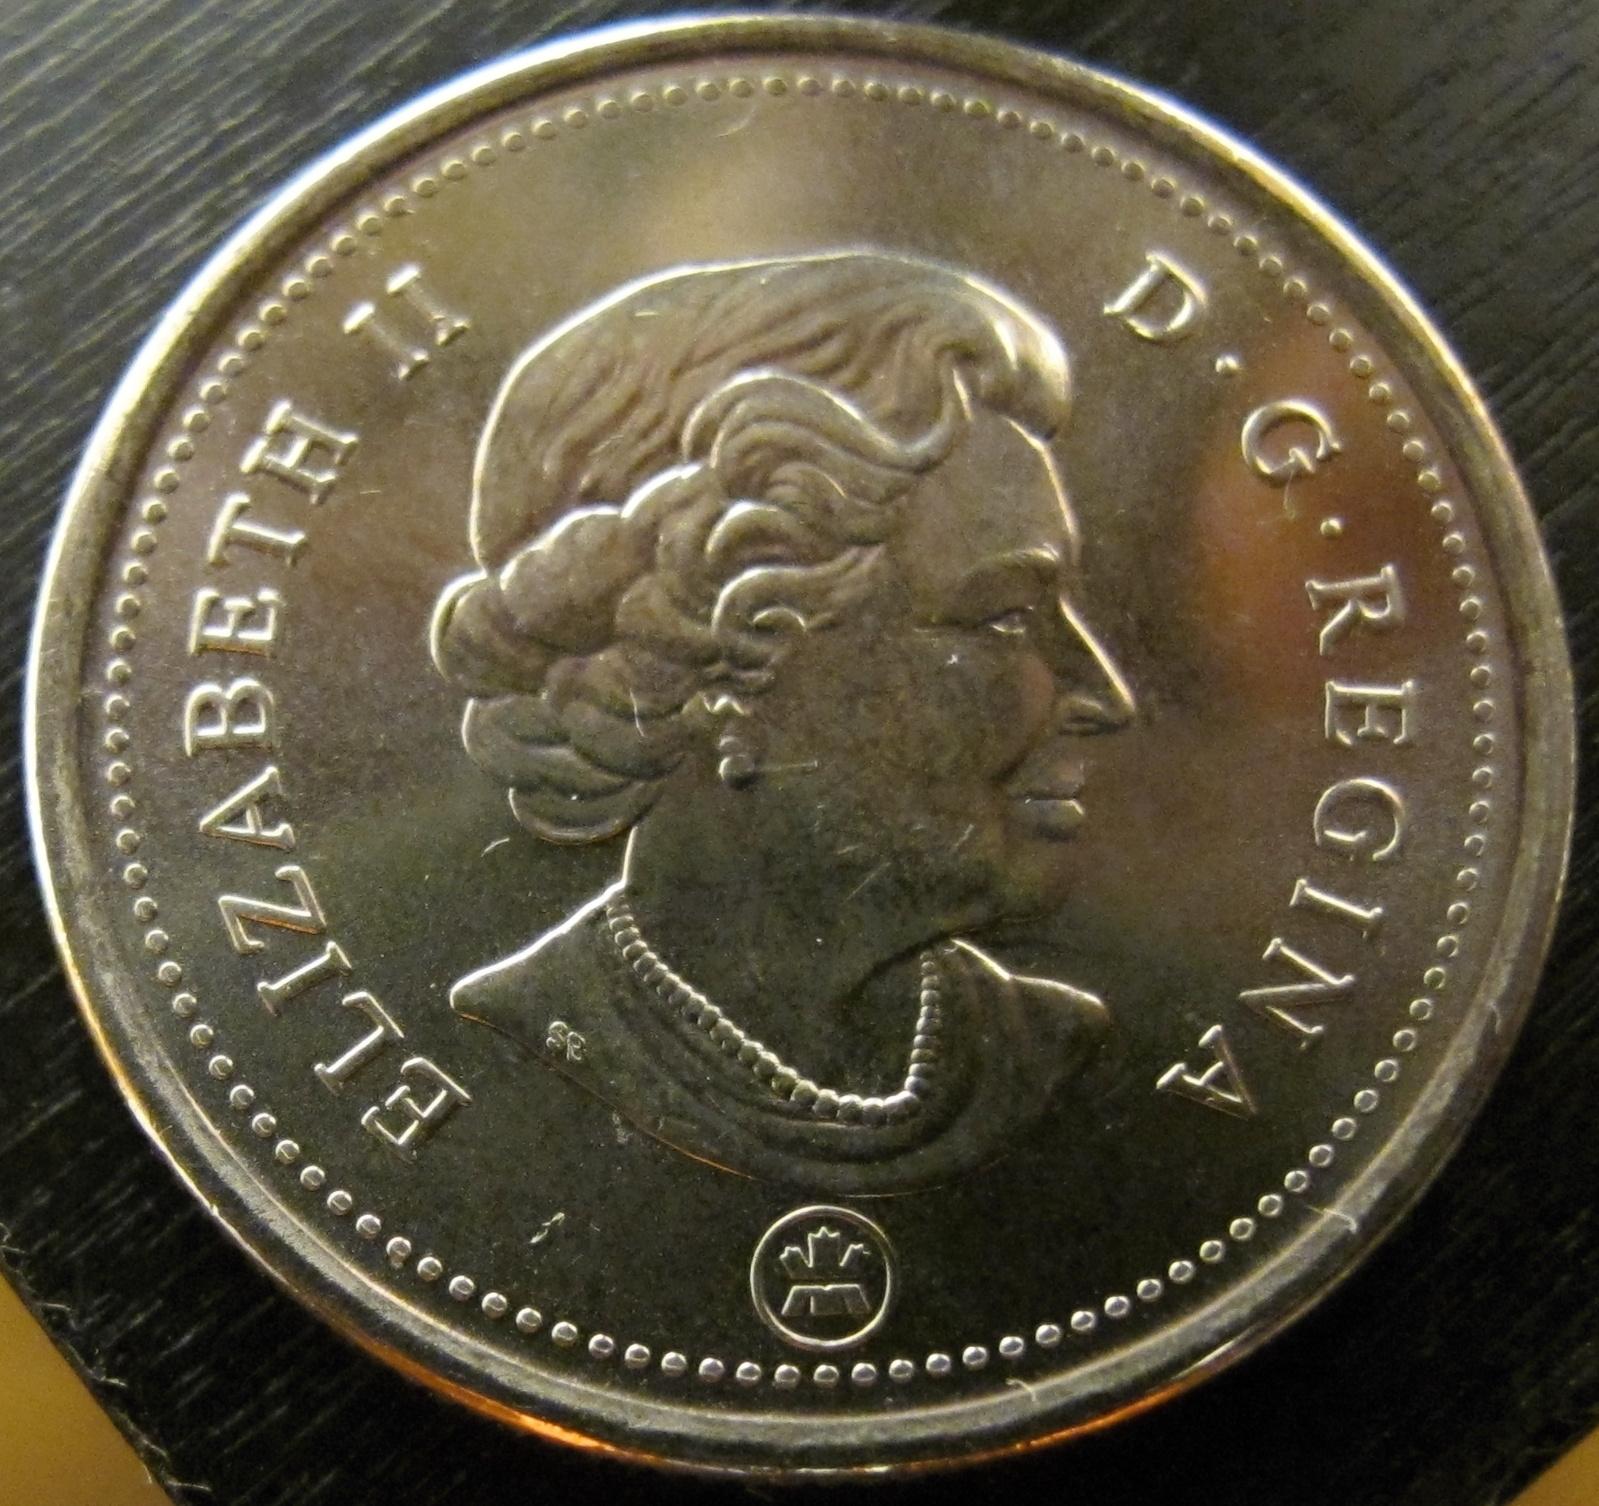 Worksheet Canadian Quarters coined for money img 1248 jpg